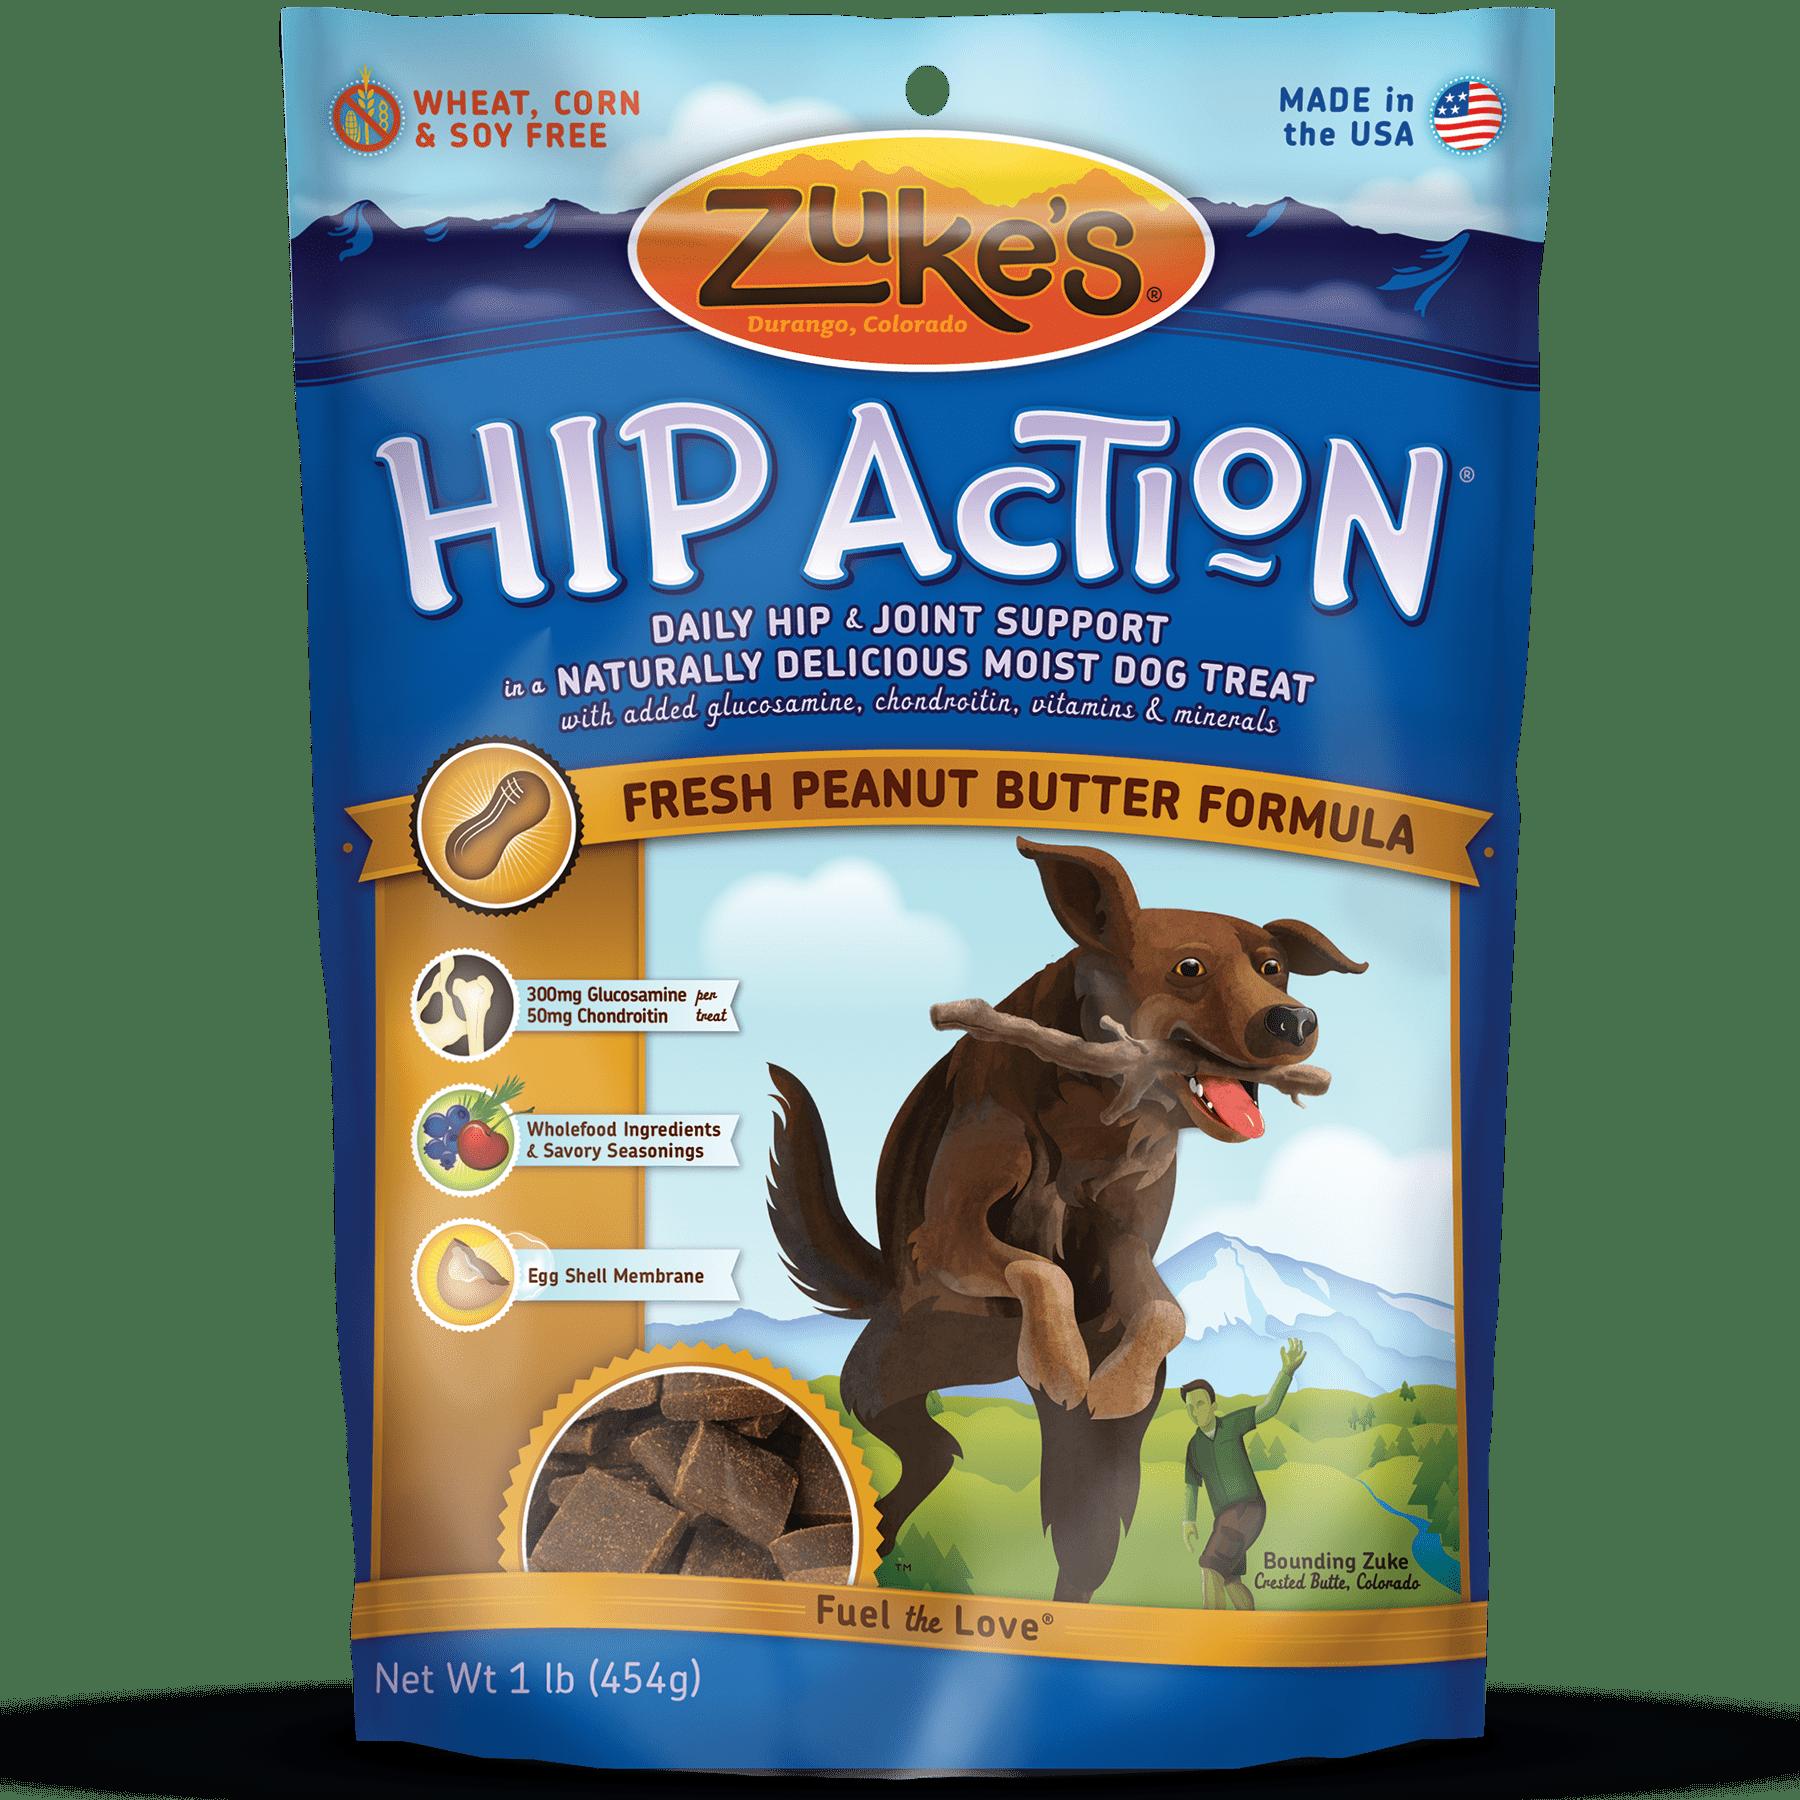 Zukes hip action fresh peanut butter recipe dog joint supplement forumfinder Gallery